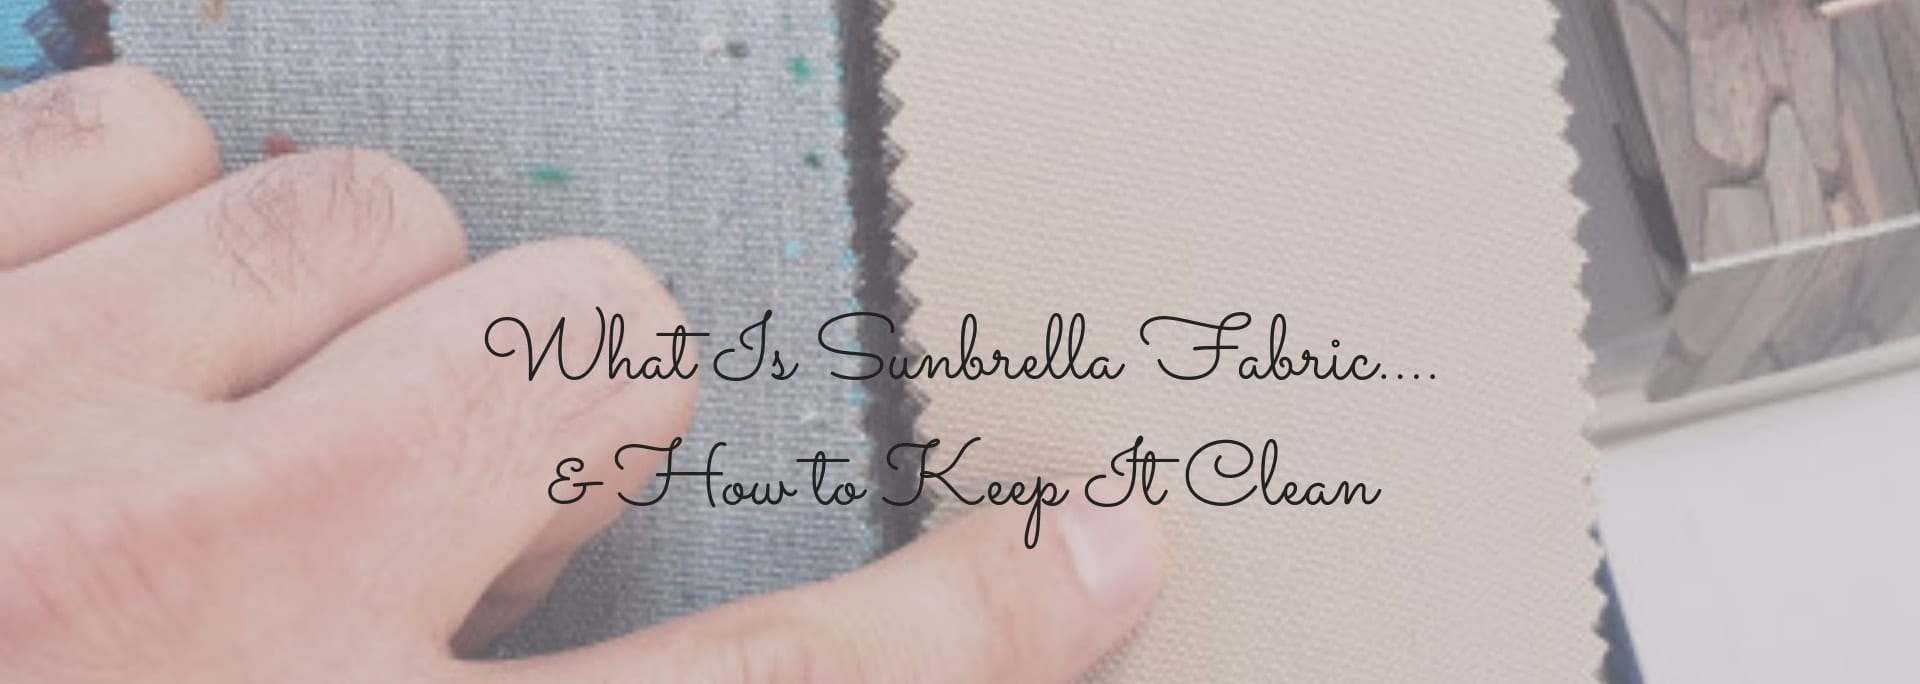 What is Sunbrella Fabric